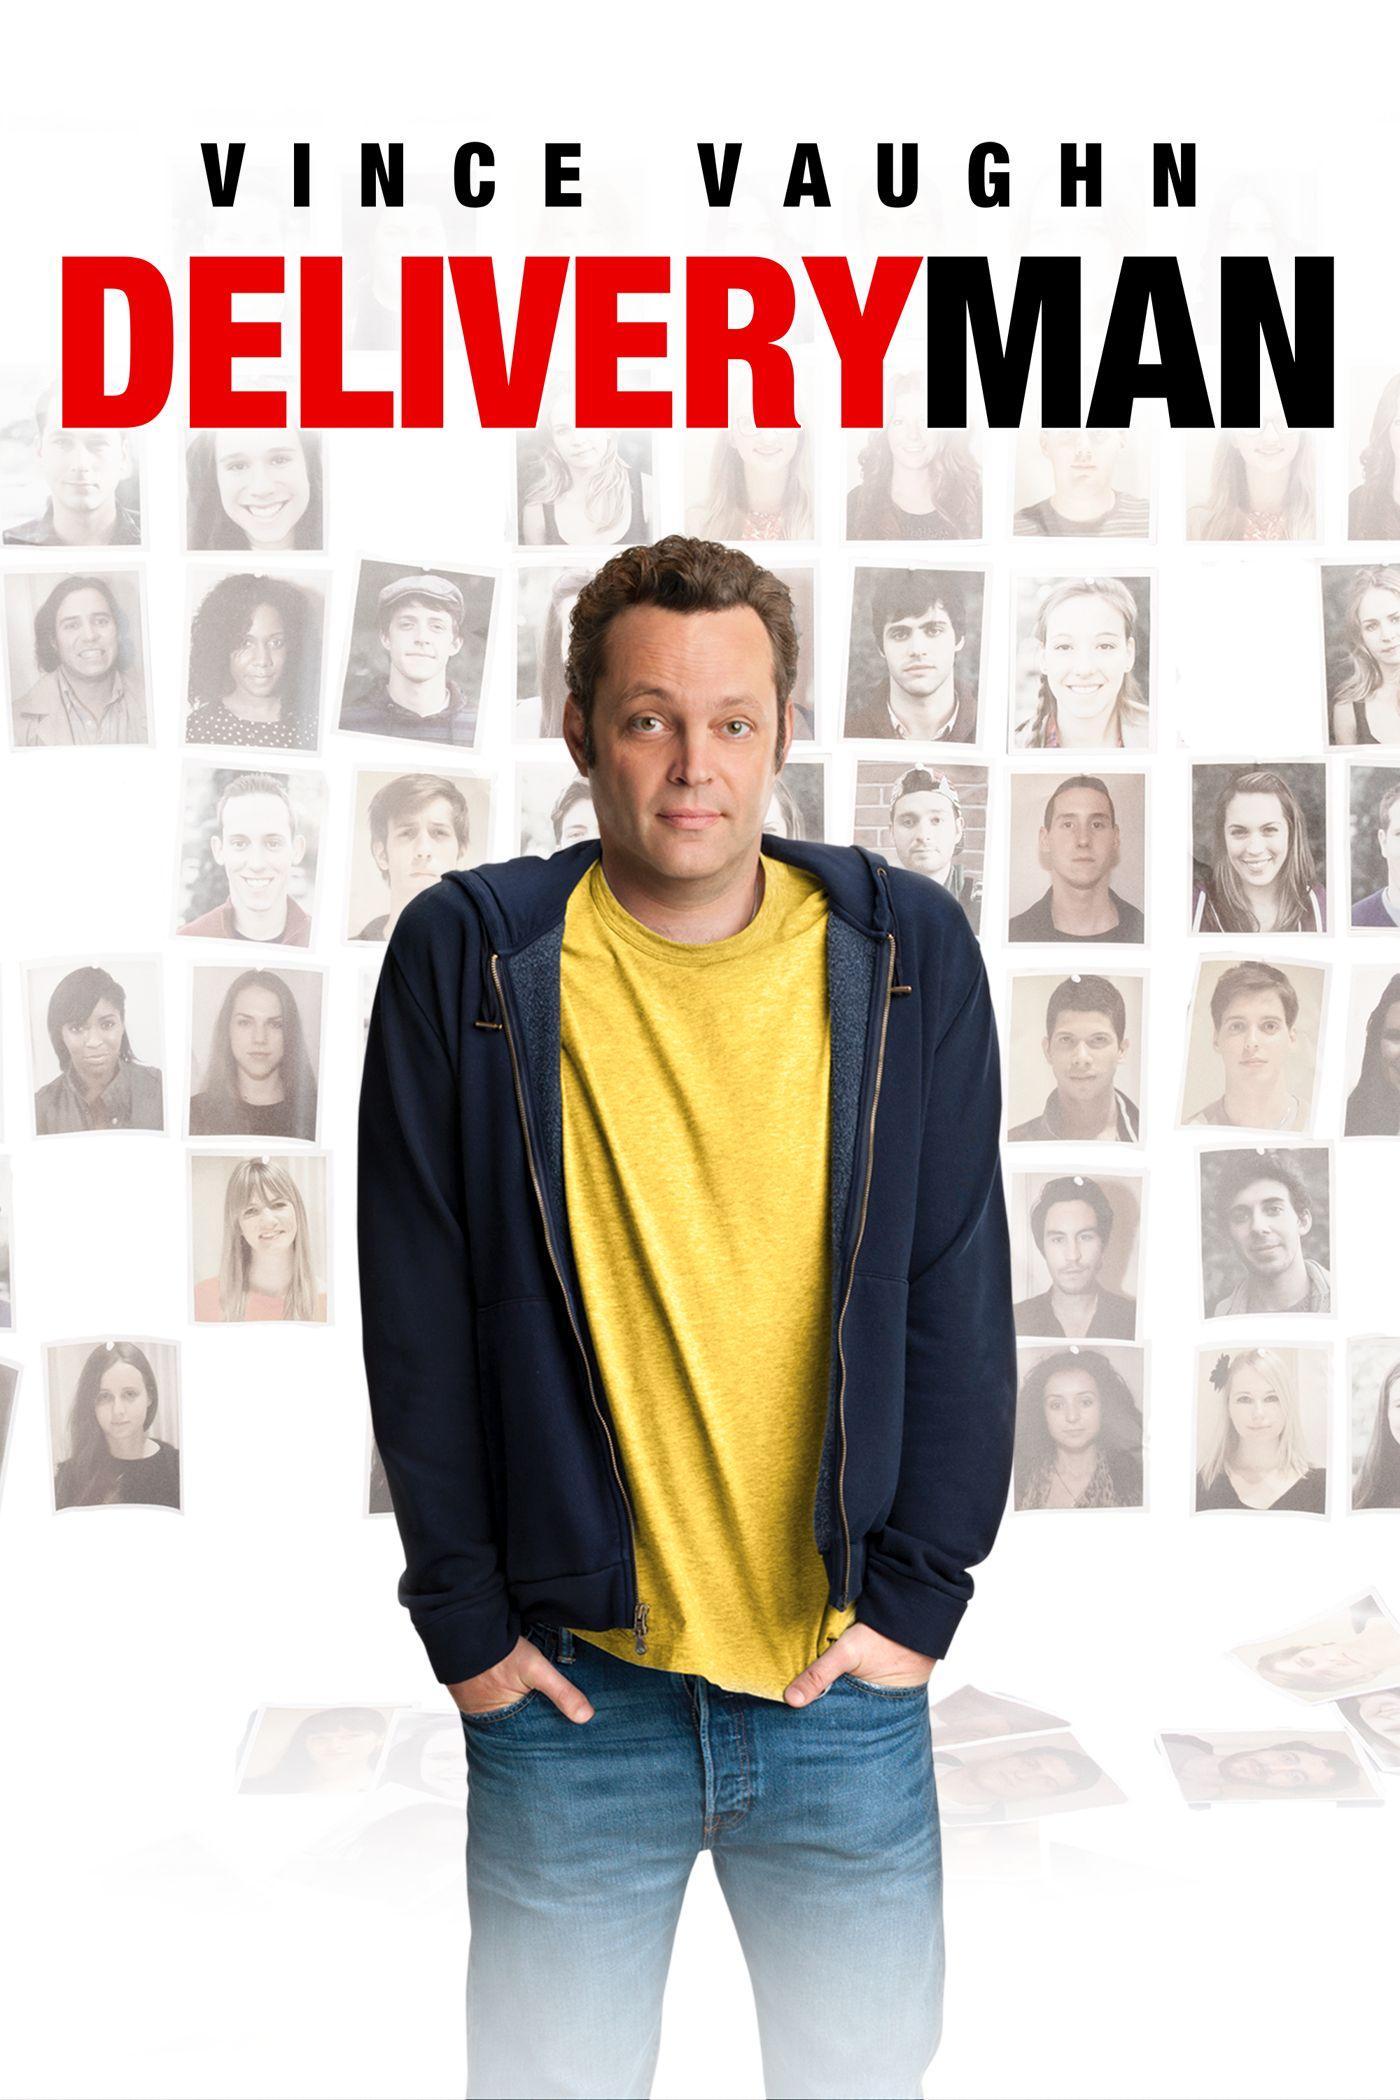 Delivery Man David Wozniak